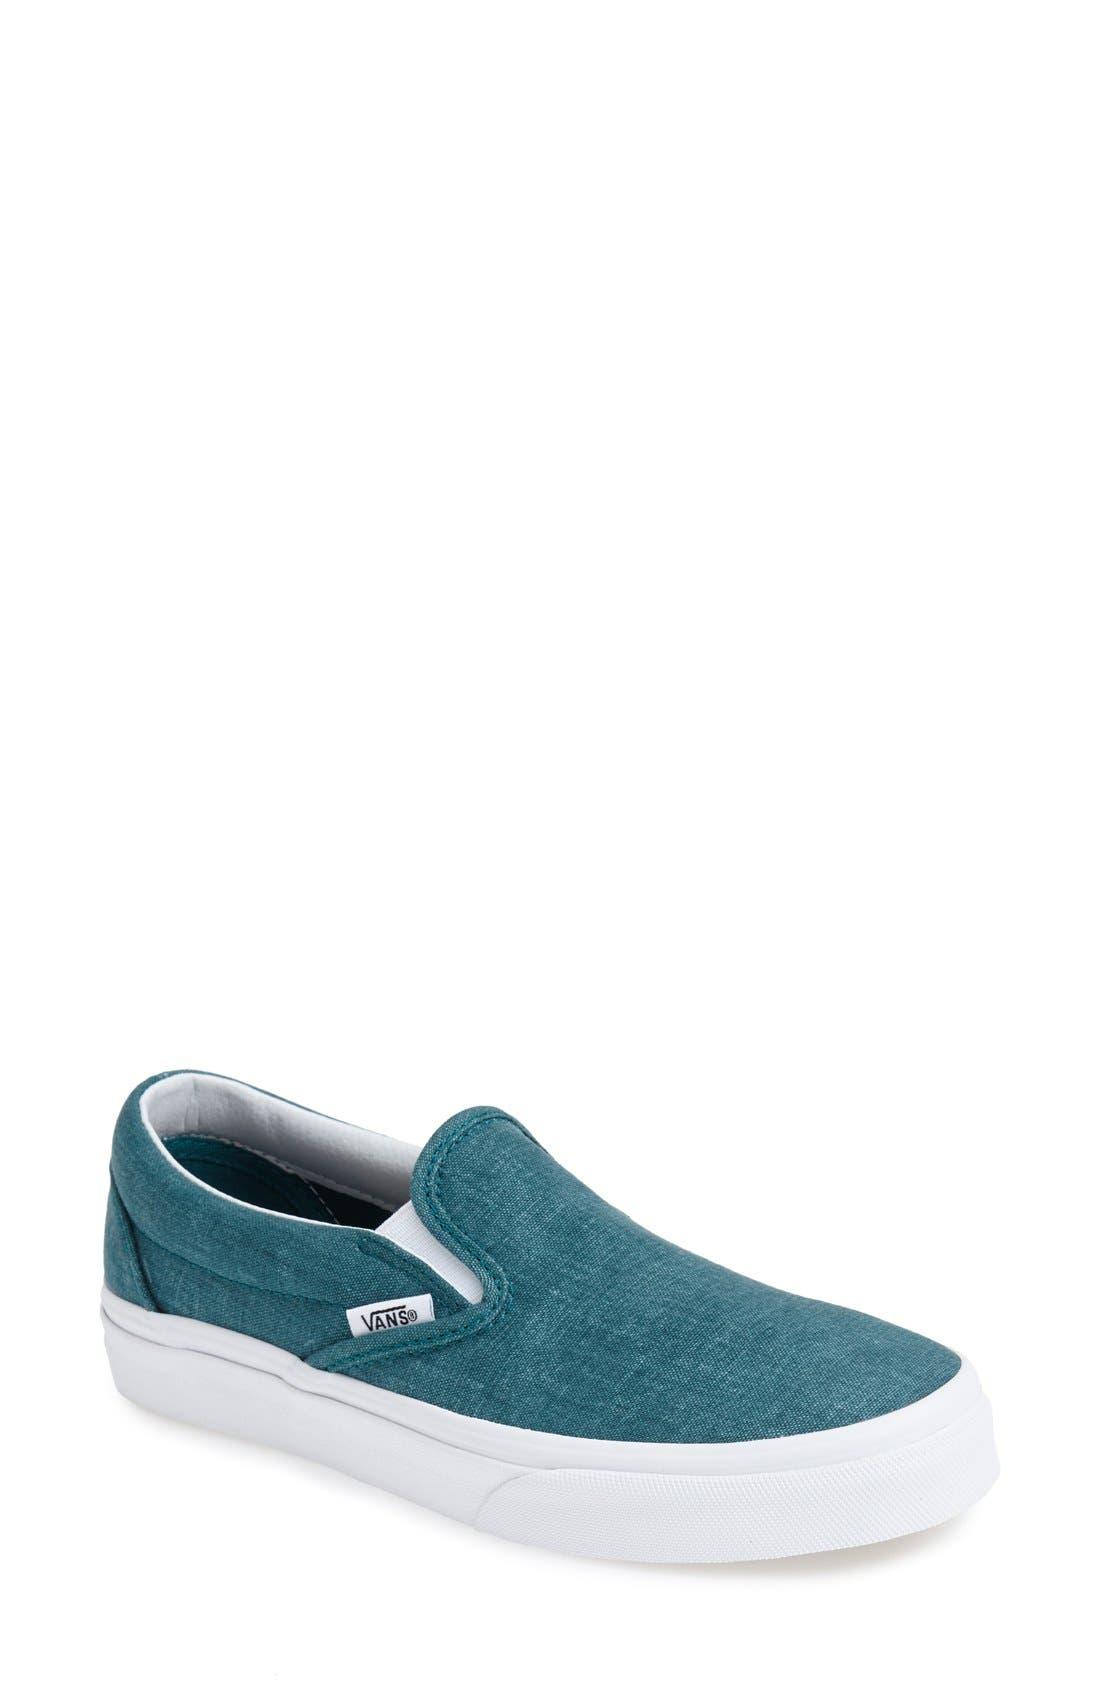 Alternate Image 1 Selected - Vans Washed Canvas Slip-On Sneaker (Women)